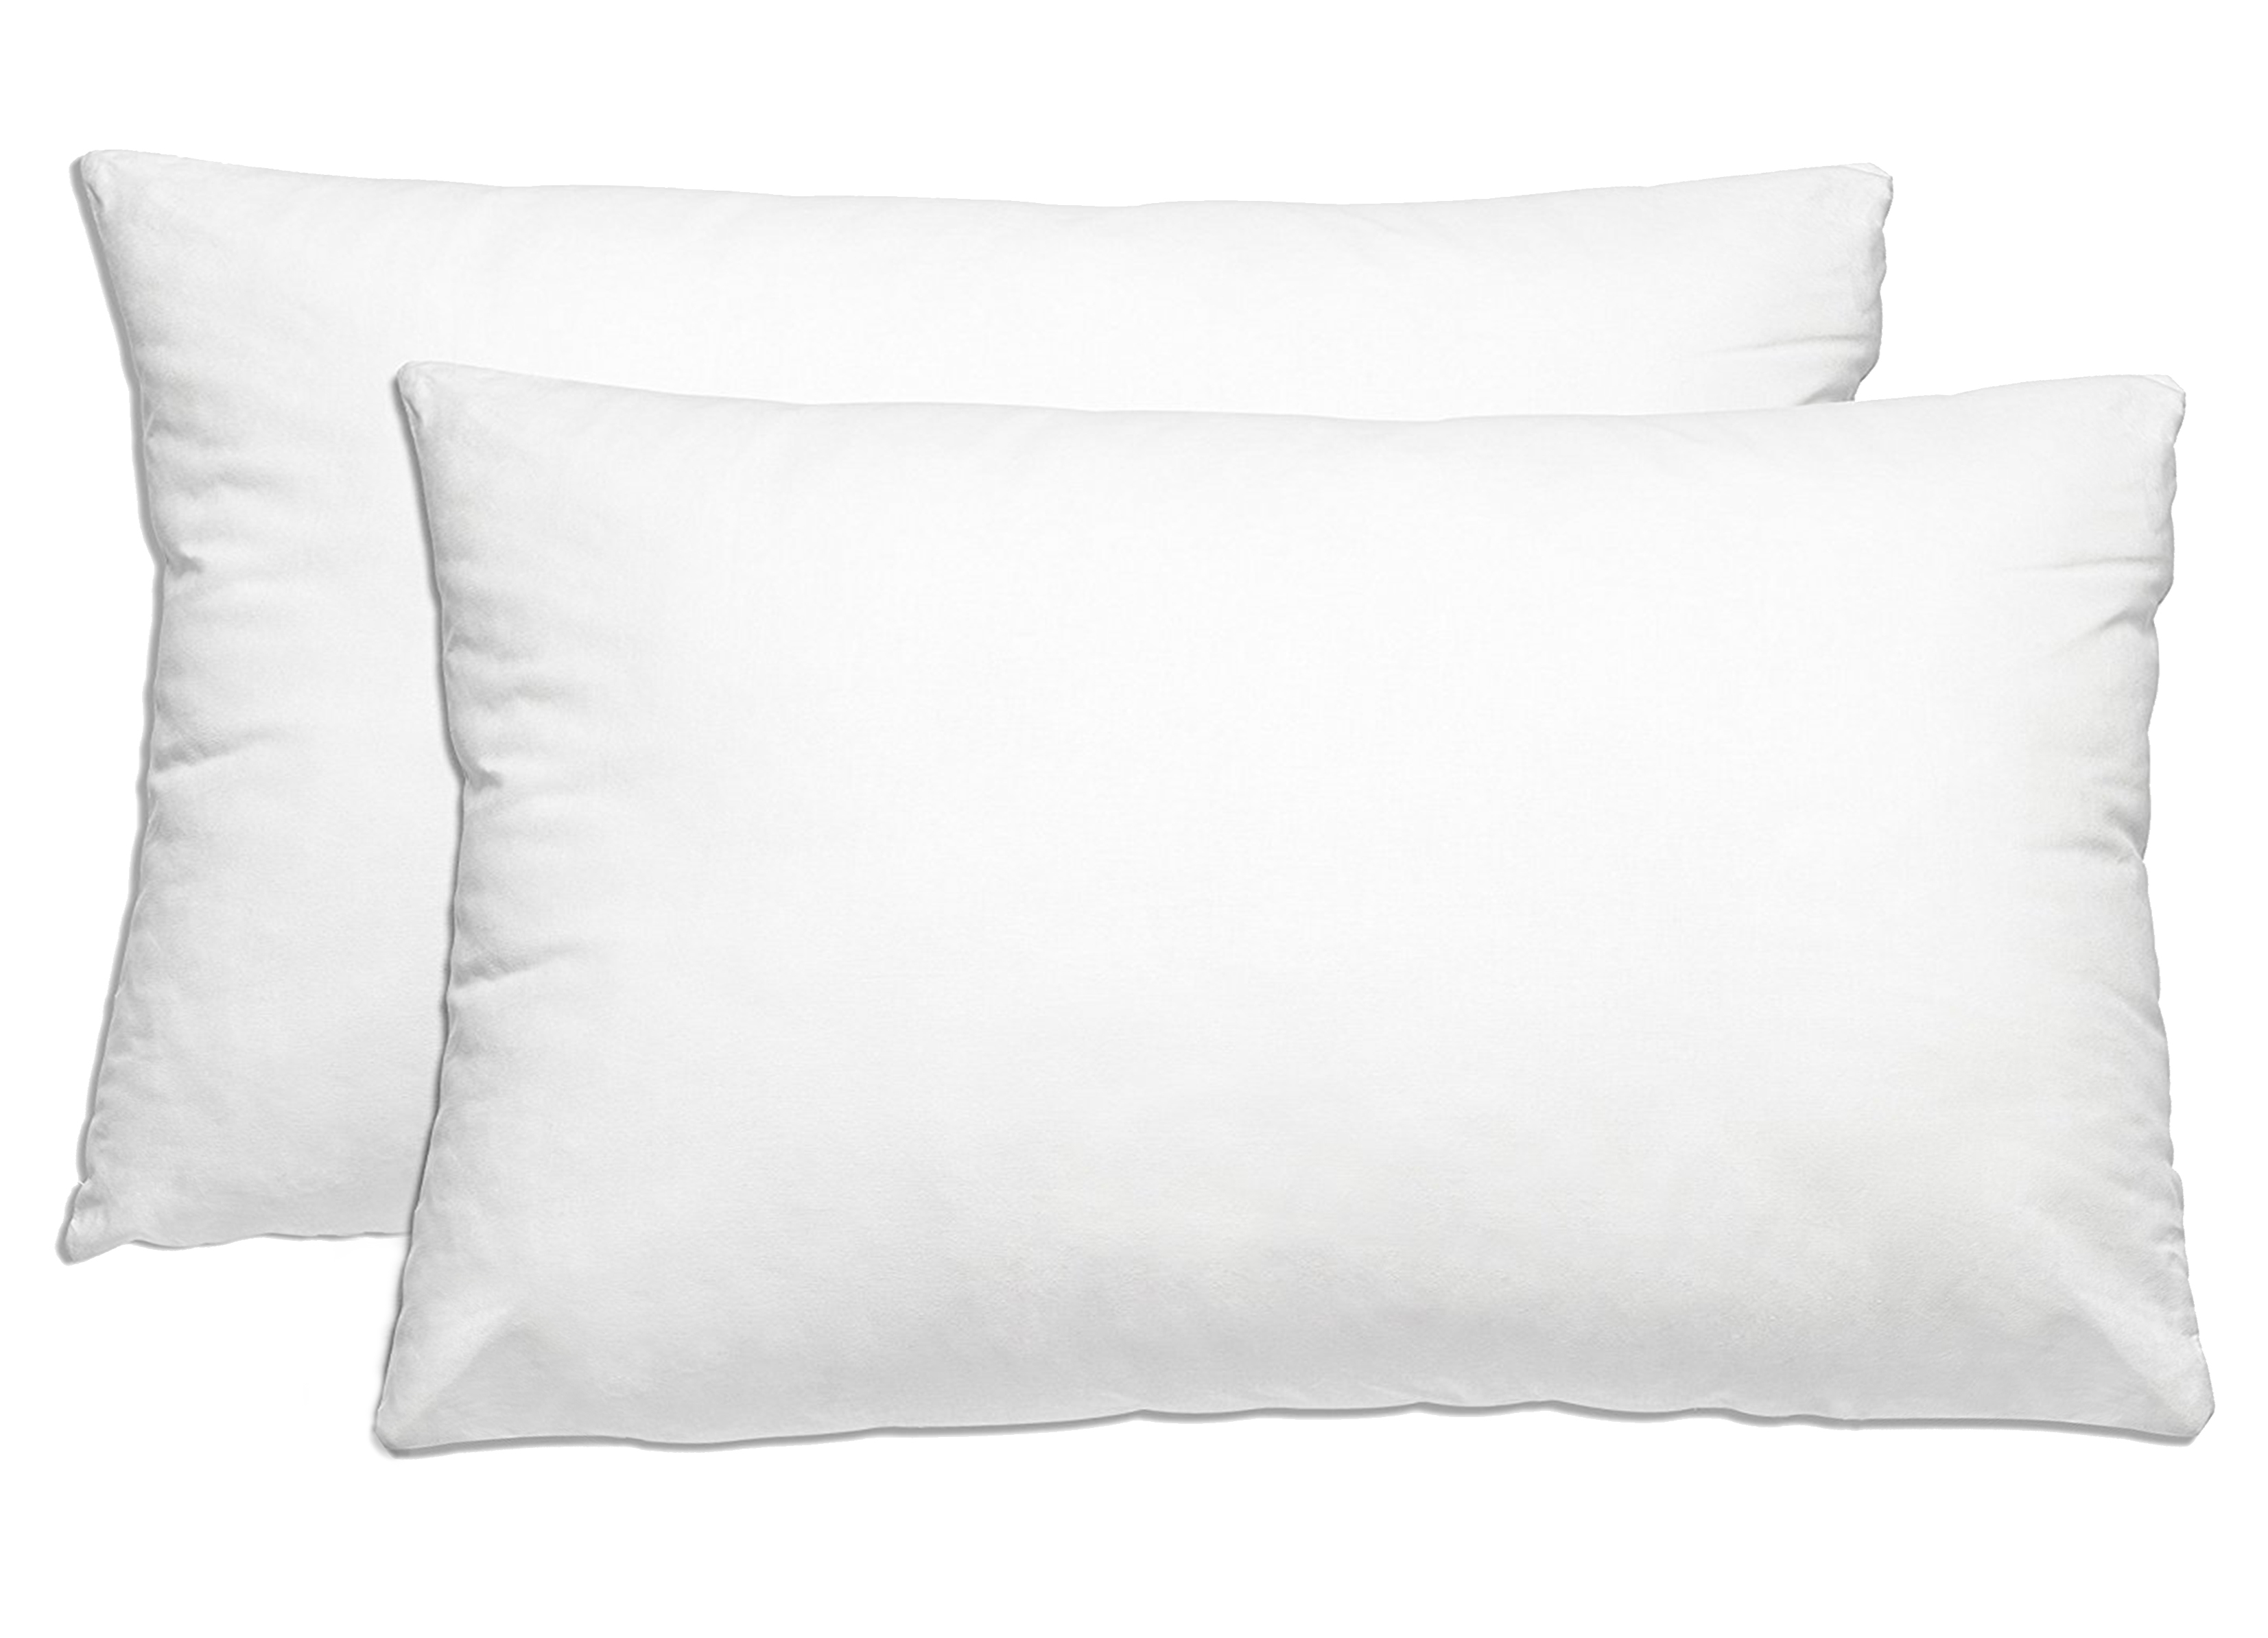 Down-alternative Premium Bed Pillows: 2 Pack - Queen / Standard